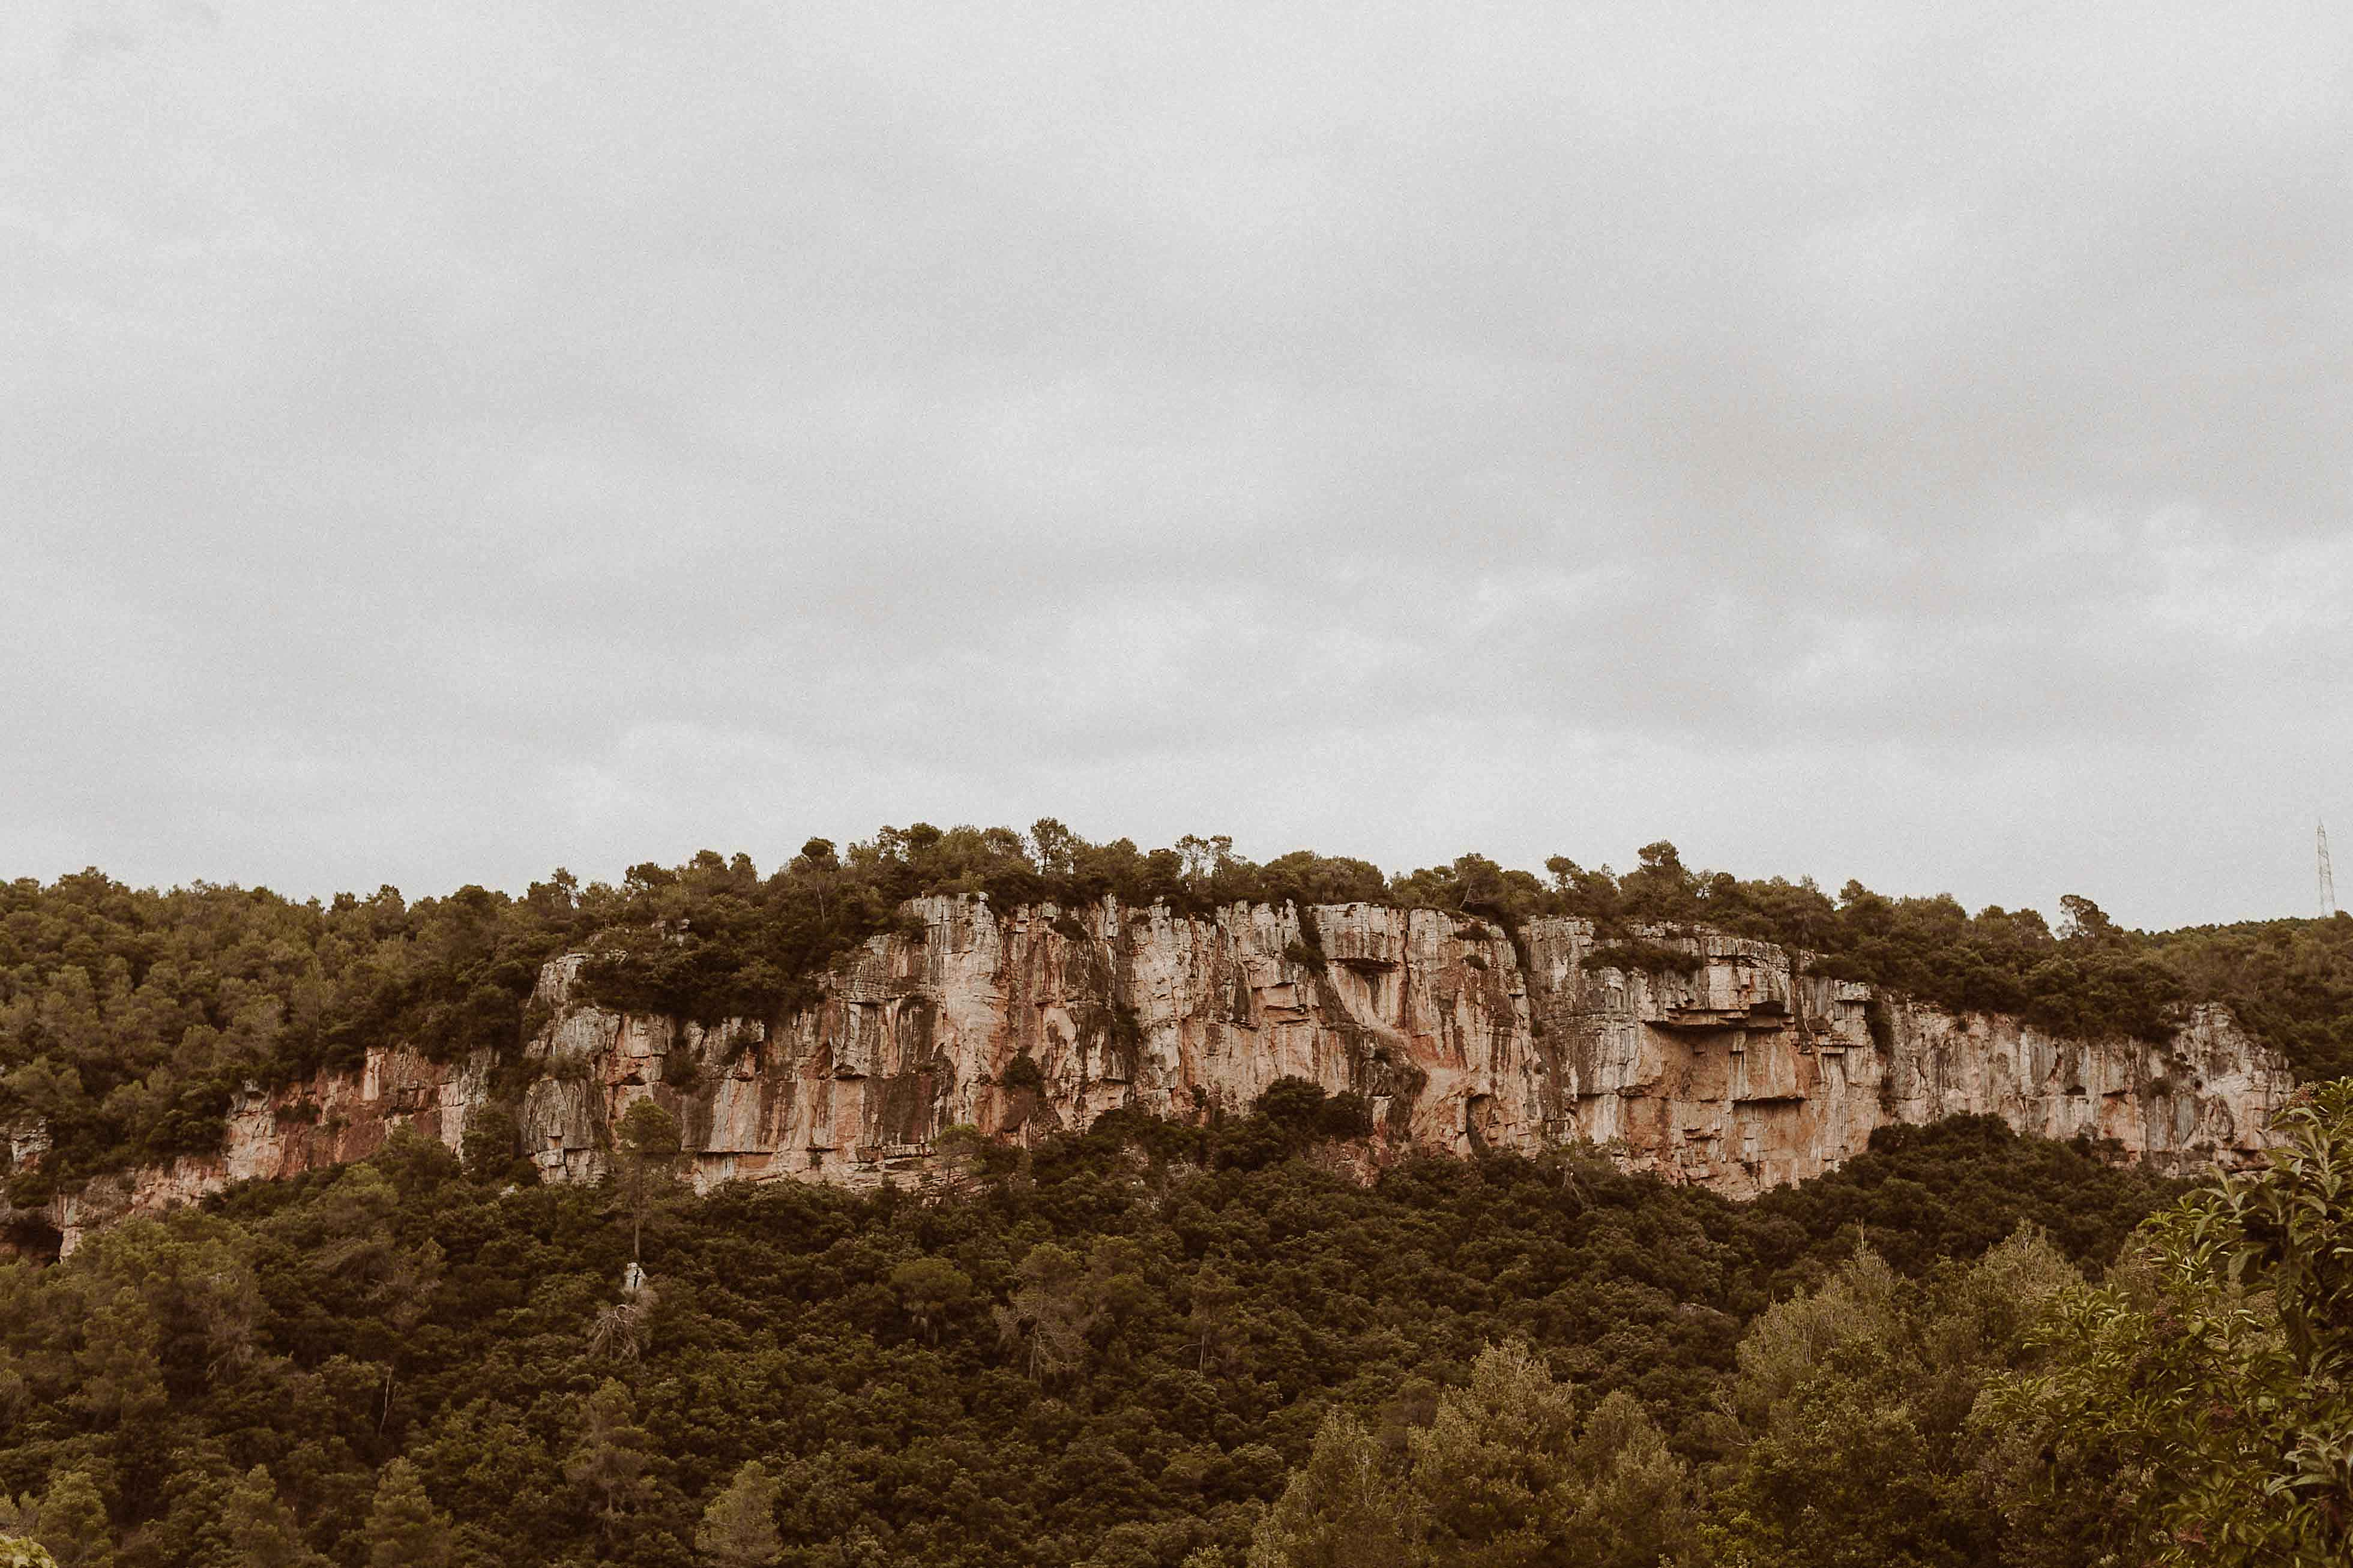 Boda rústica en la montaña. fotgrafo de bodas barcelona_017